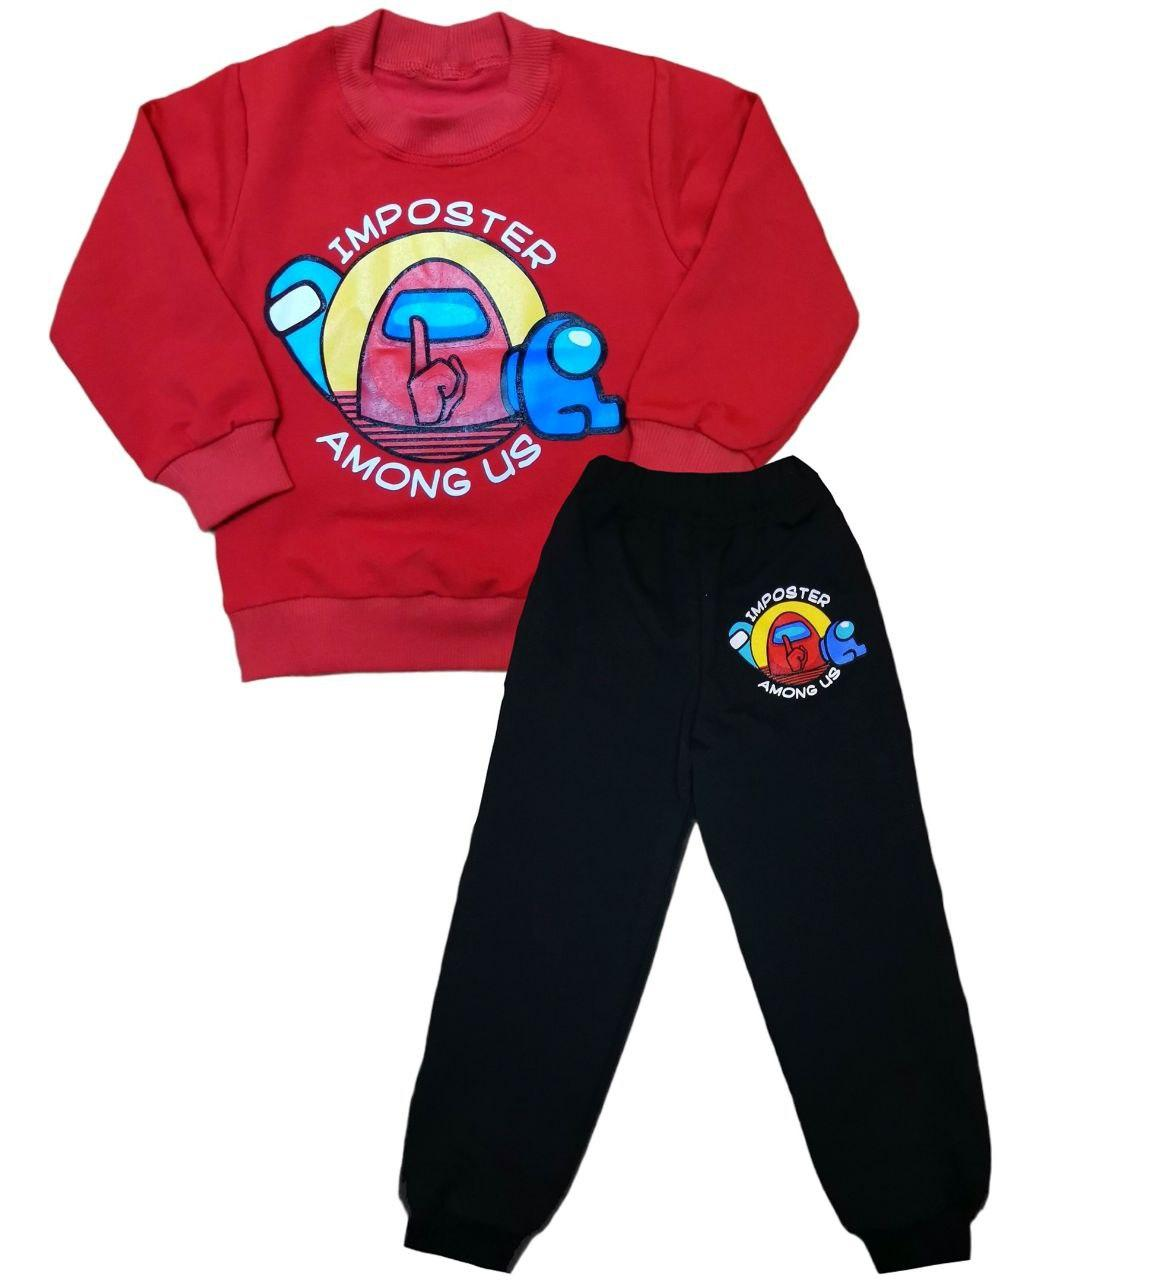 Дитячий костюм для хлопчика Among Us двунитка